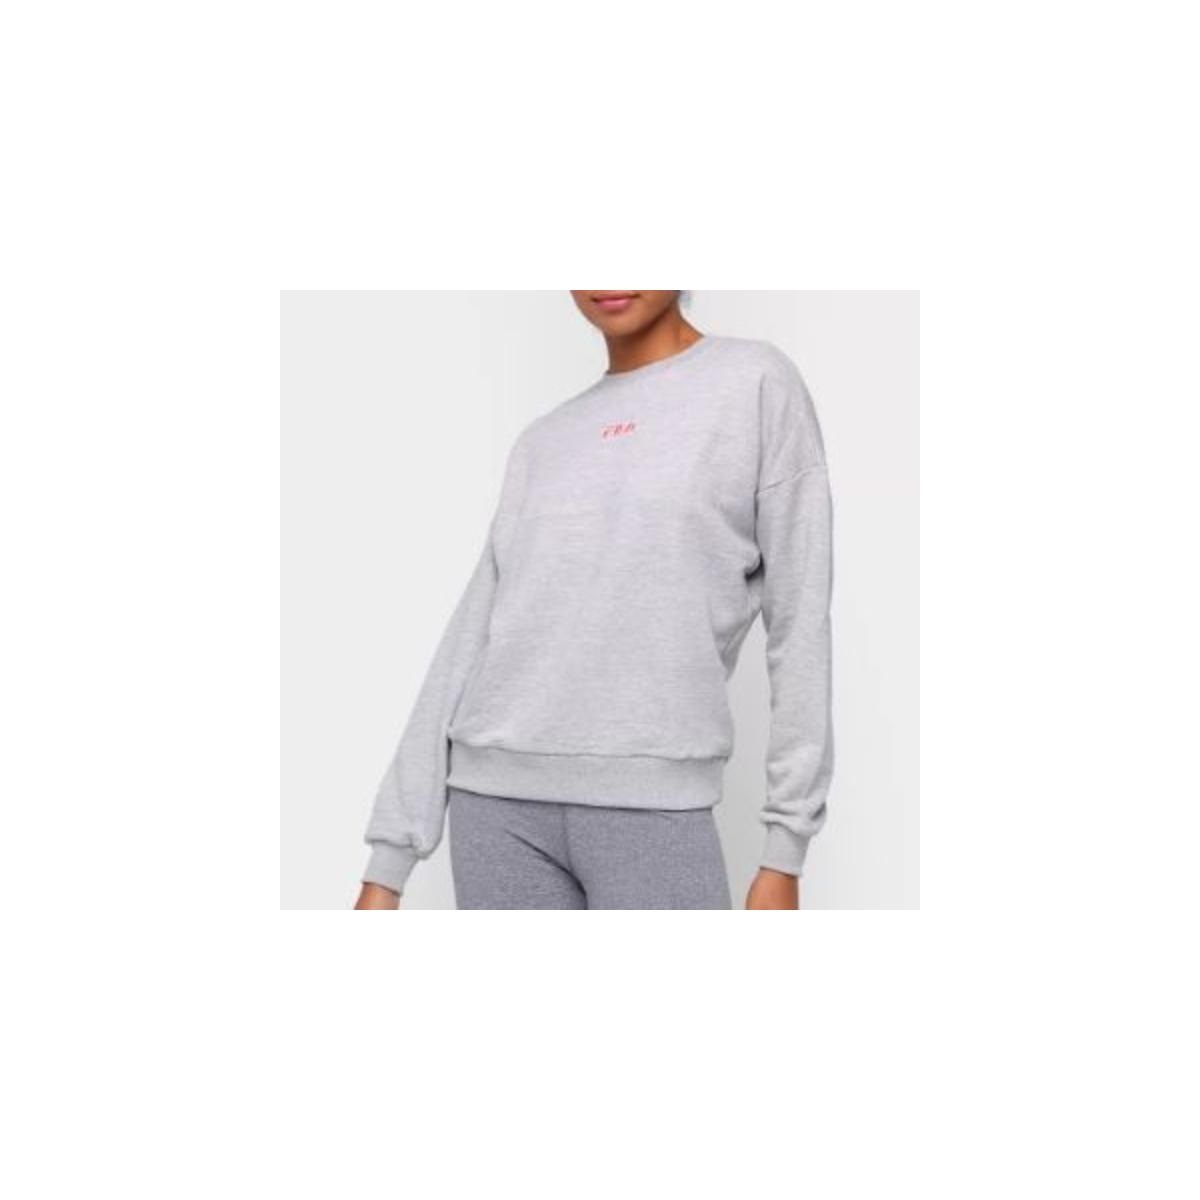 Blusão Feminino Fila F12l522013.2458 Comfy Mescla/rosa